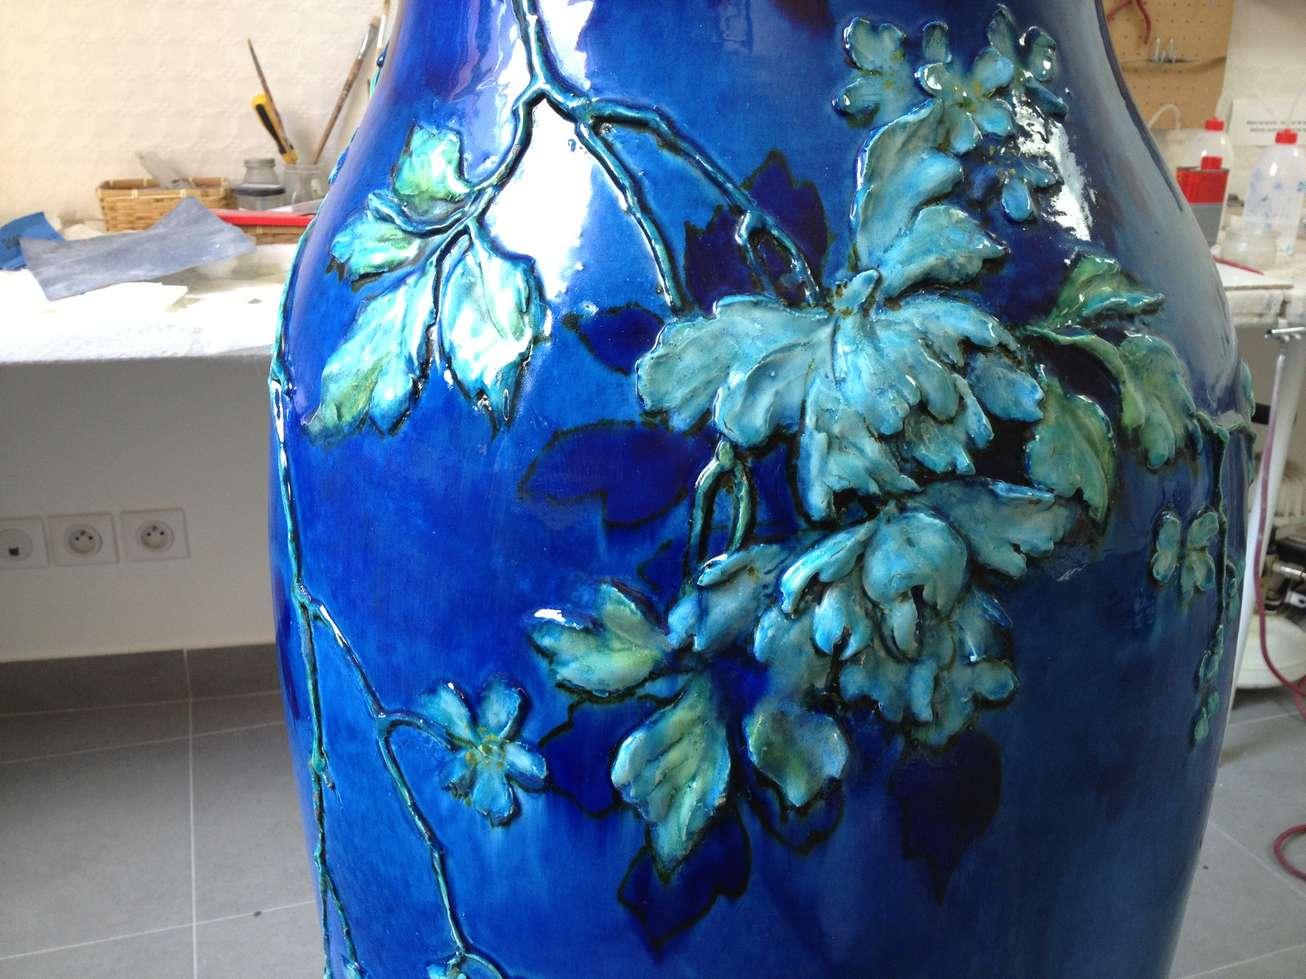 lachenal-gres-email-emaux-edmond-raoul-deck-art-ceramique-restaurarte.jpg